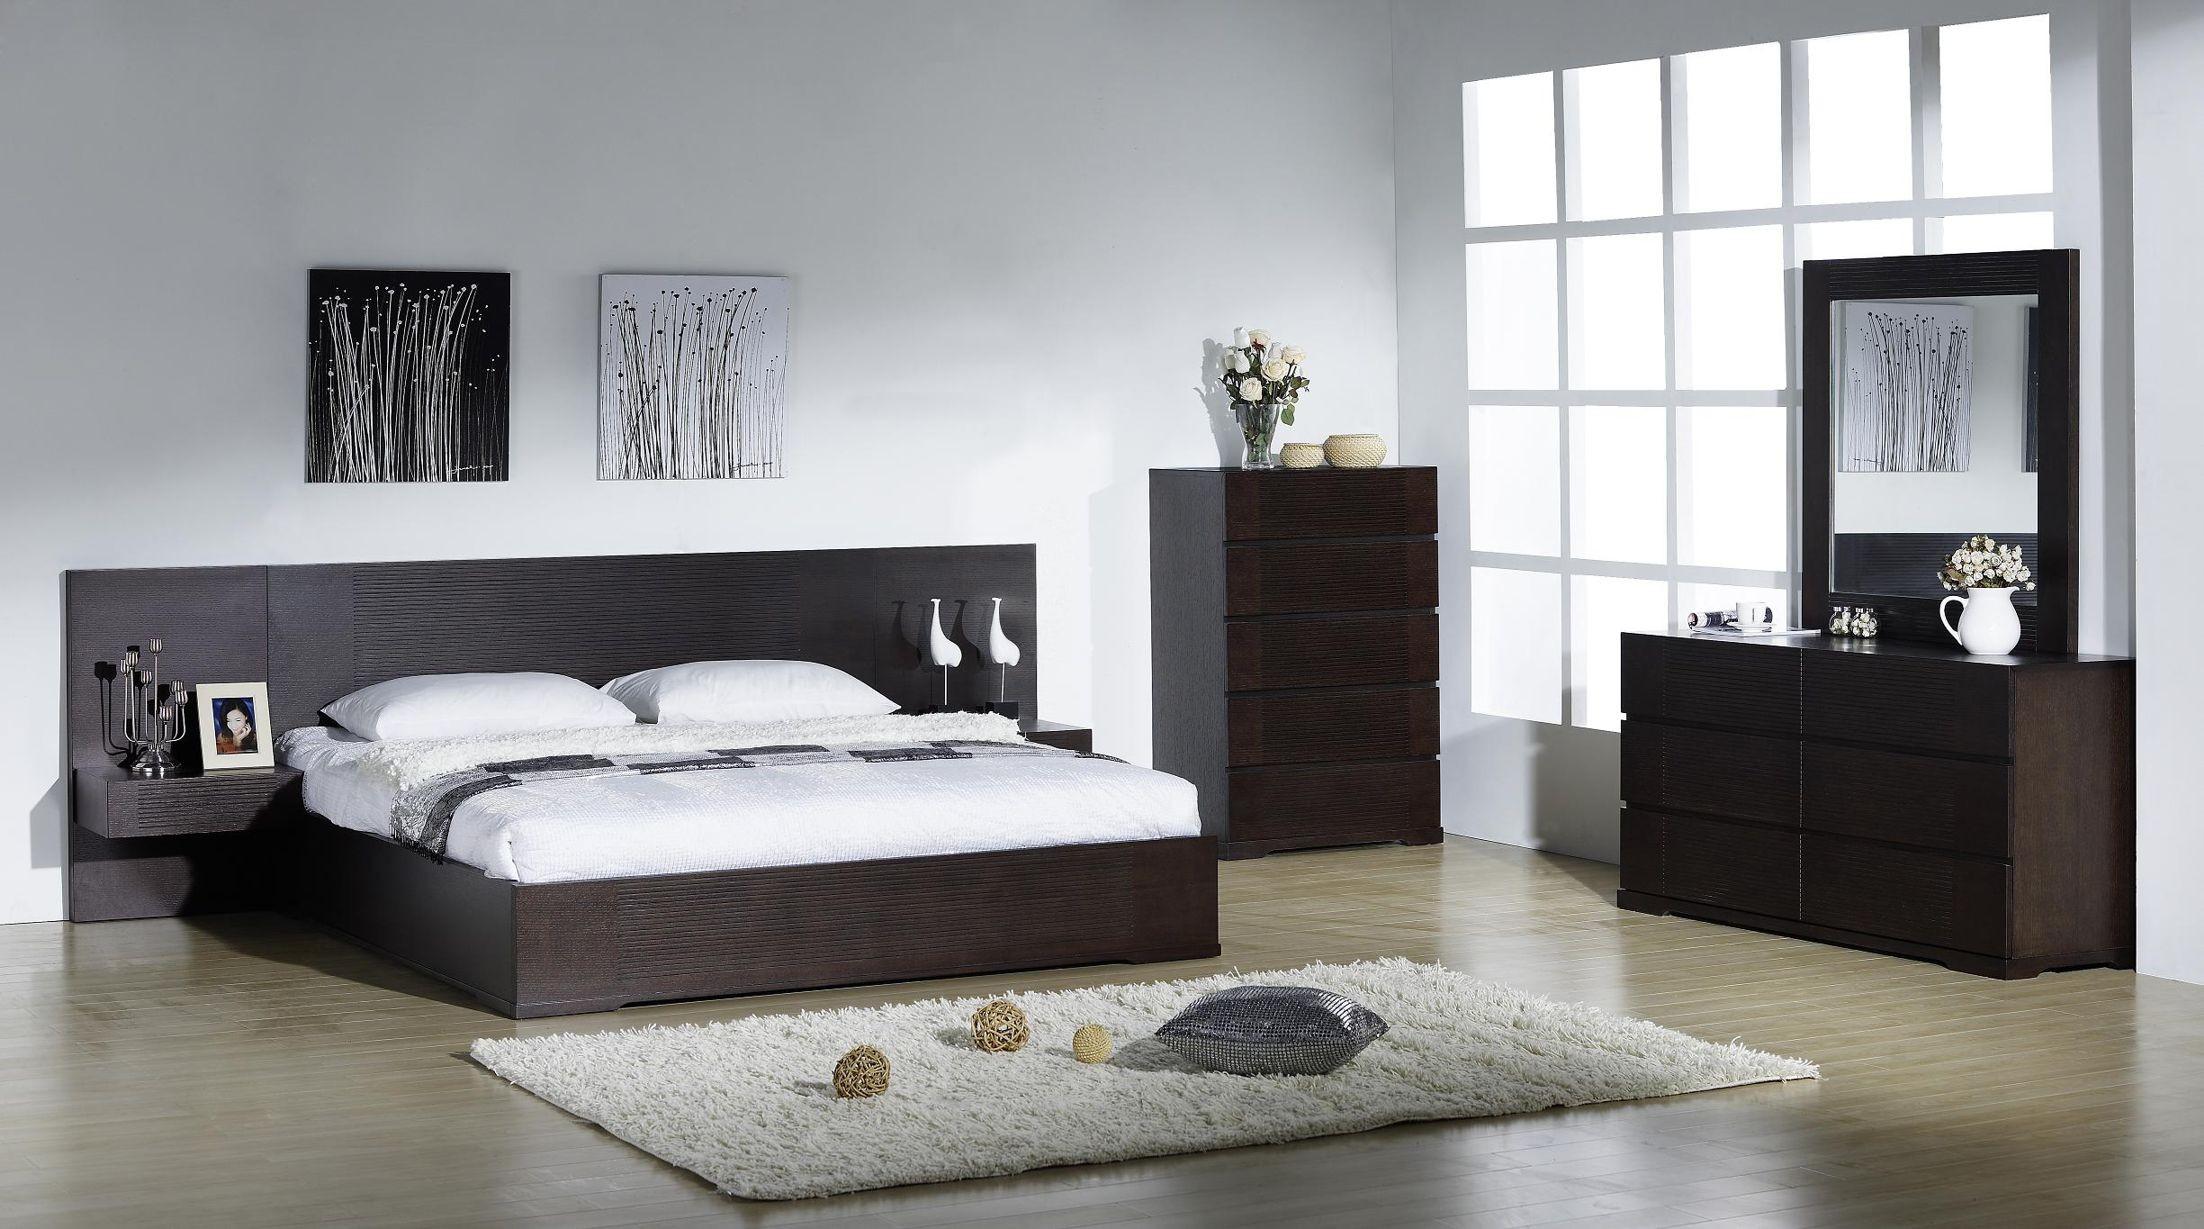 CADO Modern Furniture - ECHO Modern Bedroom Set